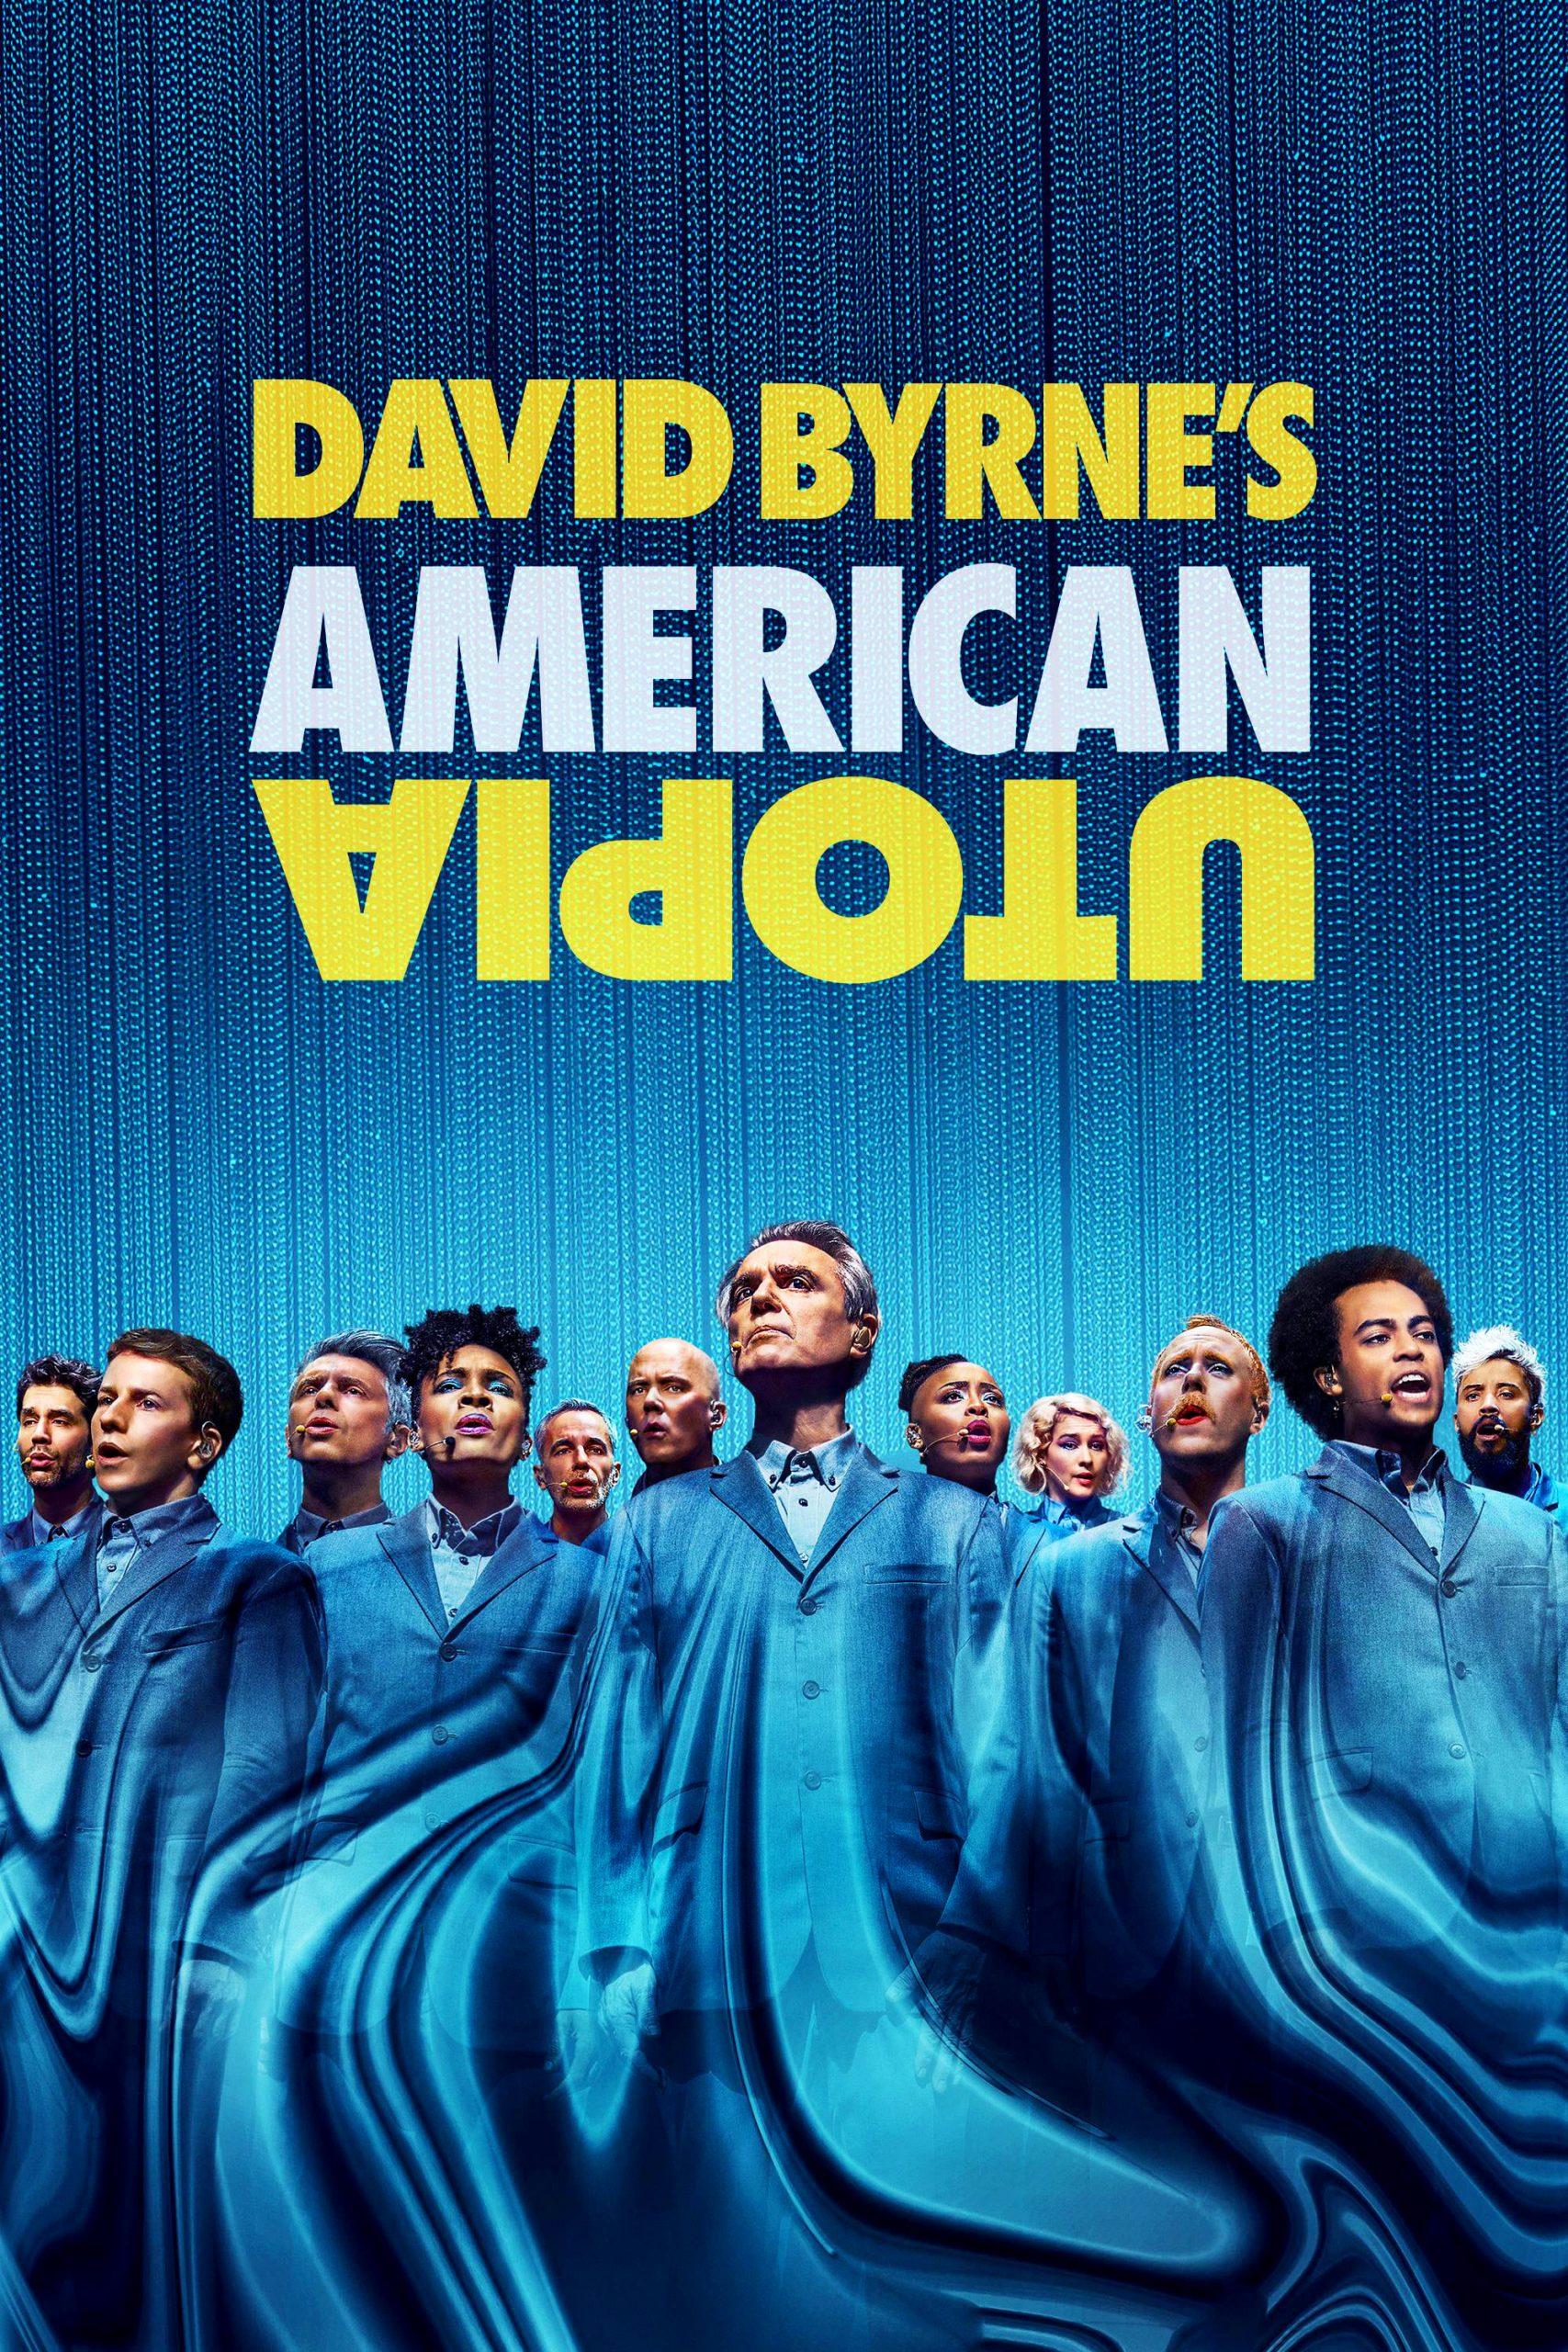 Poster for David Byrne's American Utopia